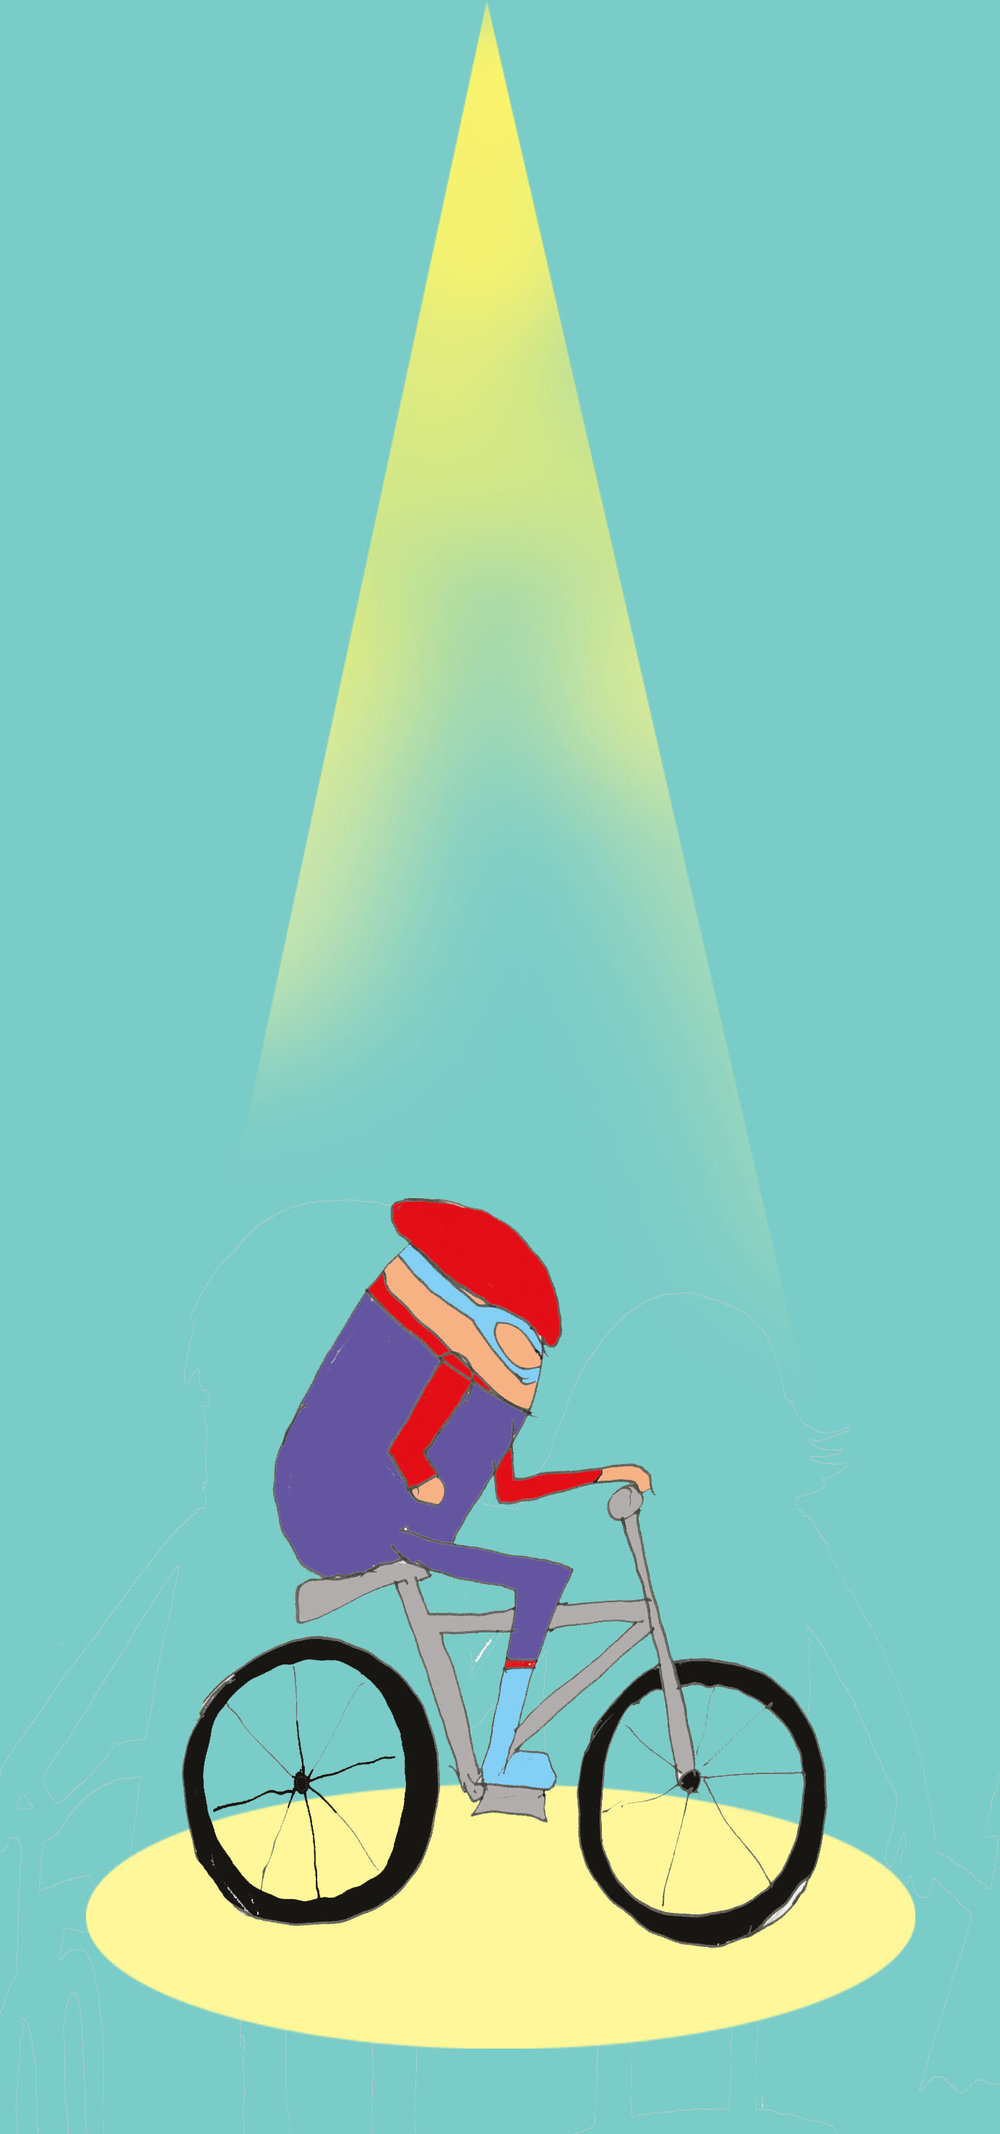 Cyclist no arm.jpg